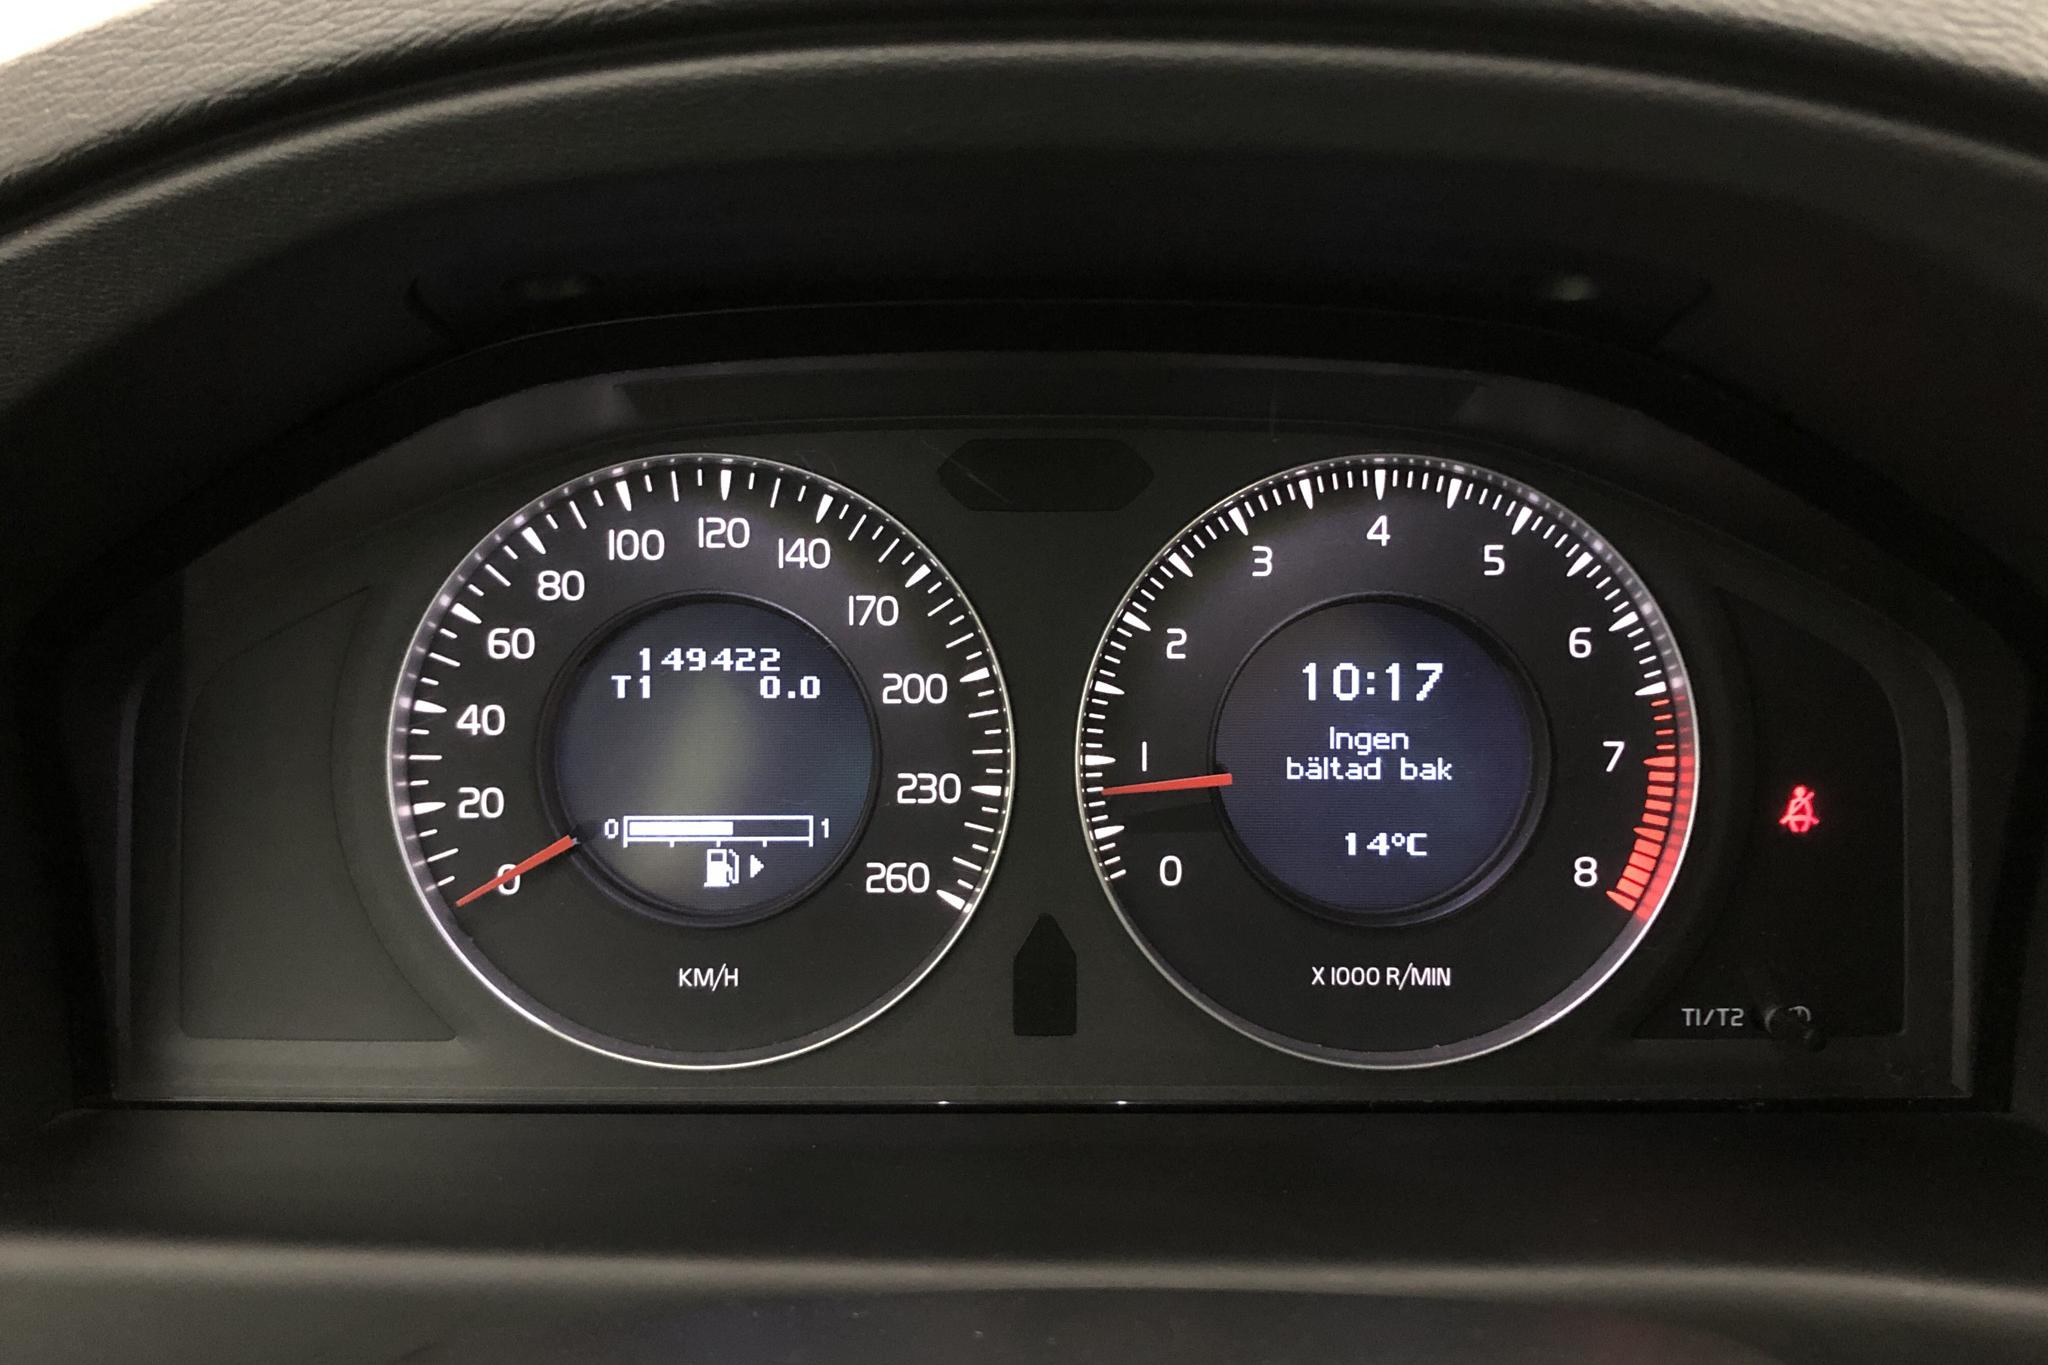 Volvo V70 II 2.0F (145hk) - 14 942 mil - Manuell - vit - 2010